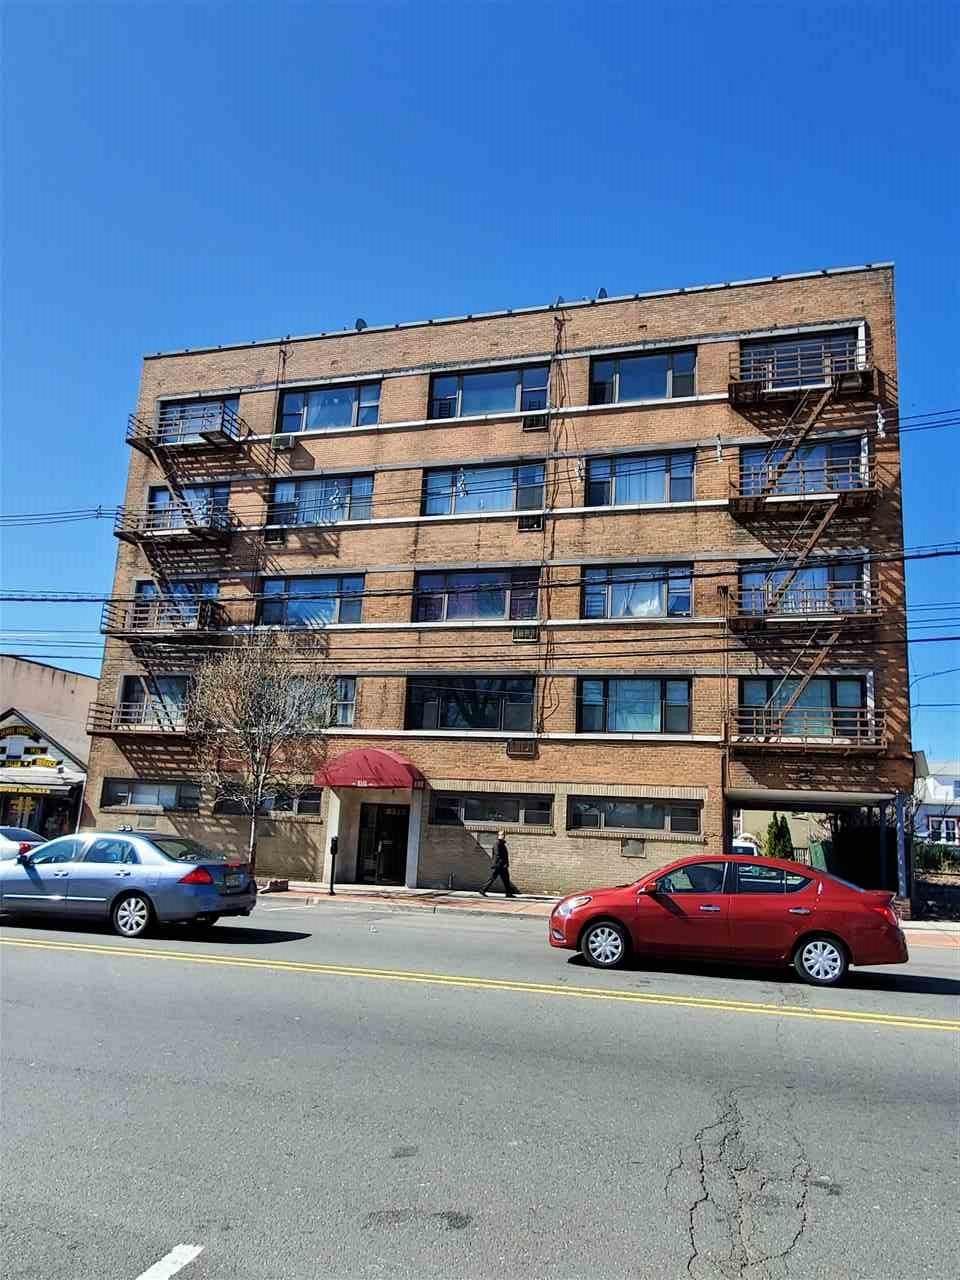 8515 Bergenline Ave - Photo 1